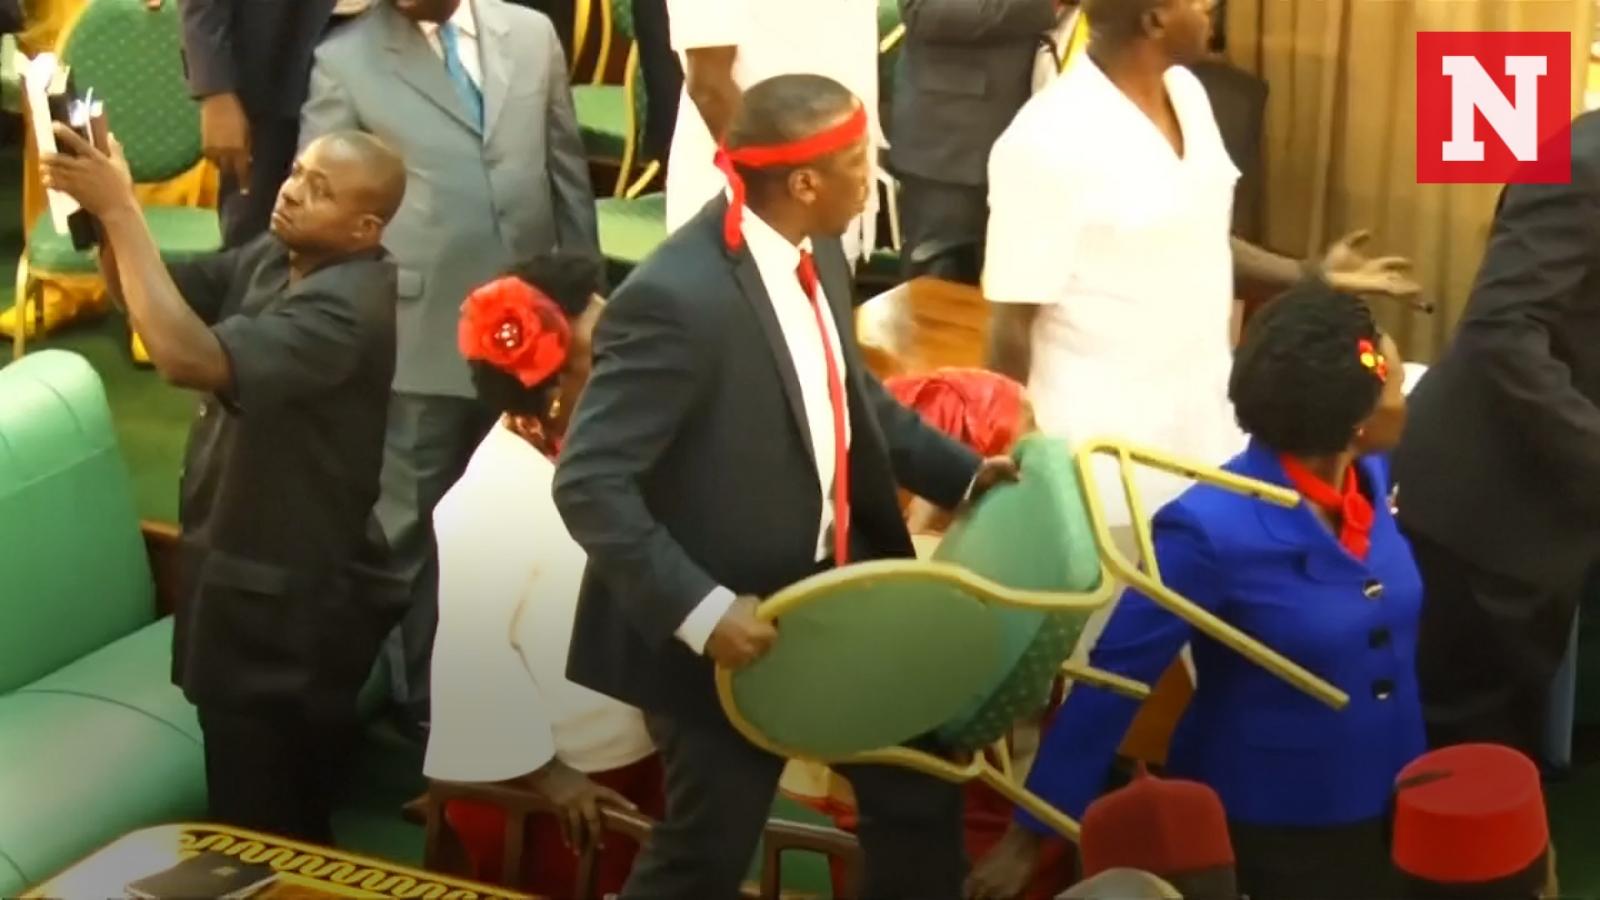 mass-brawl-breaks-out-in-ugandan-parliament